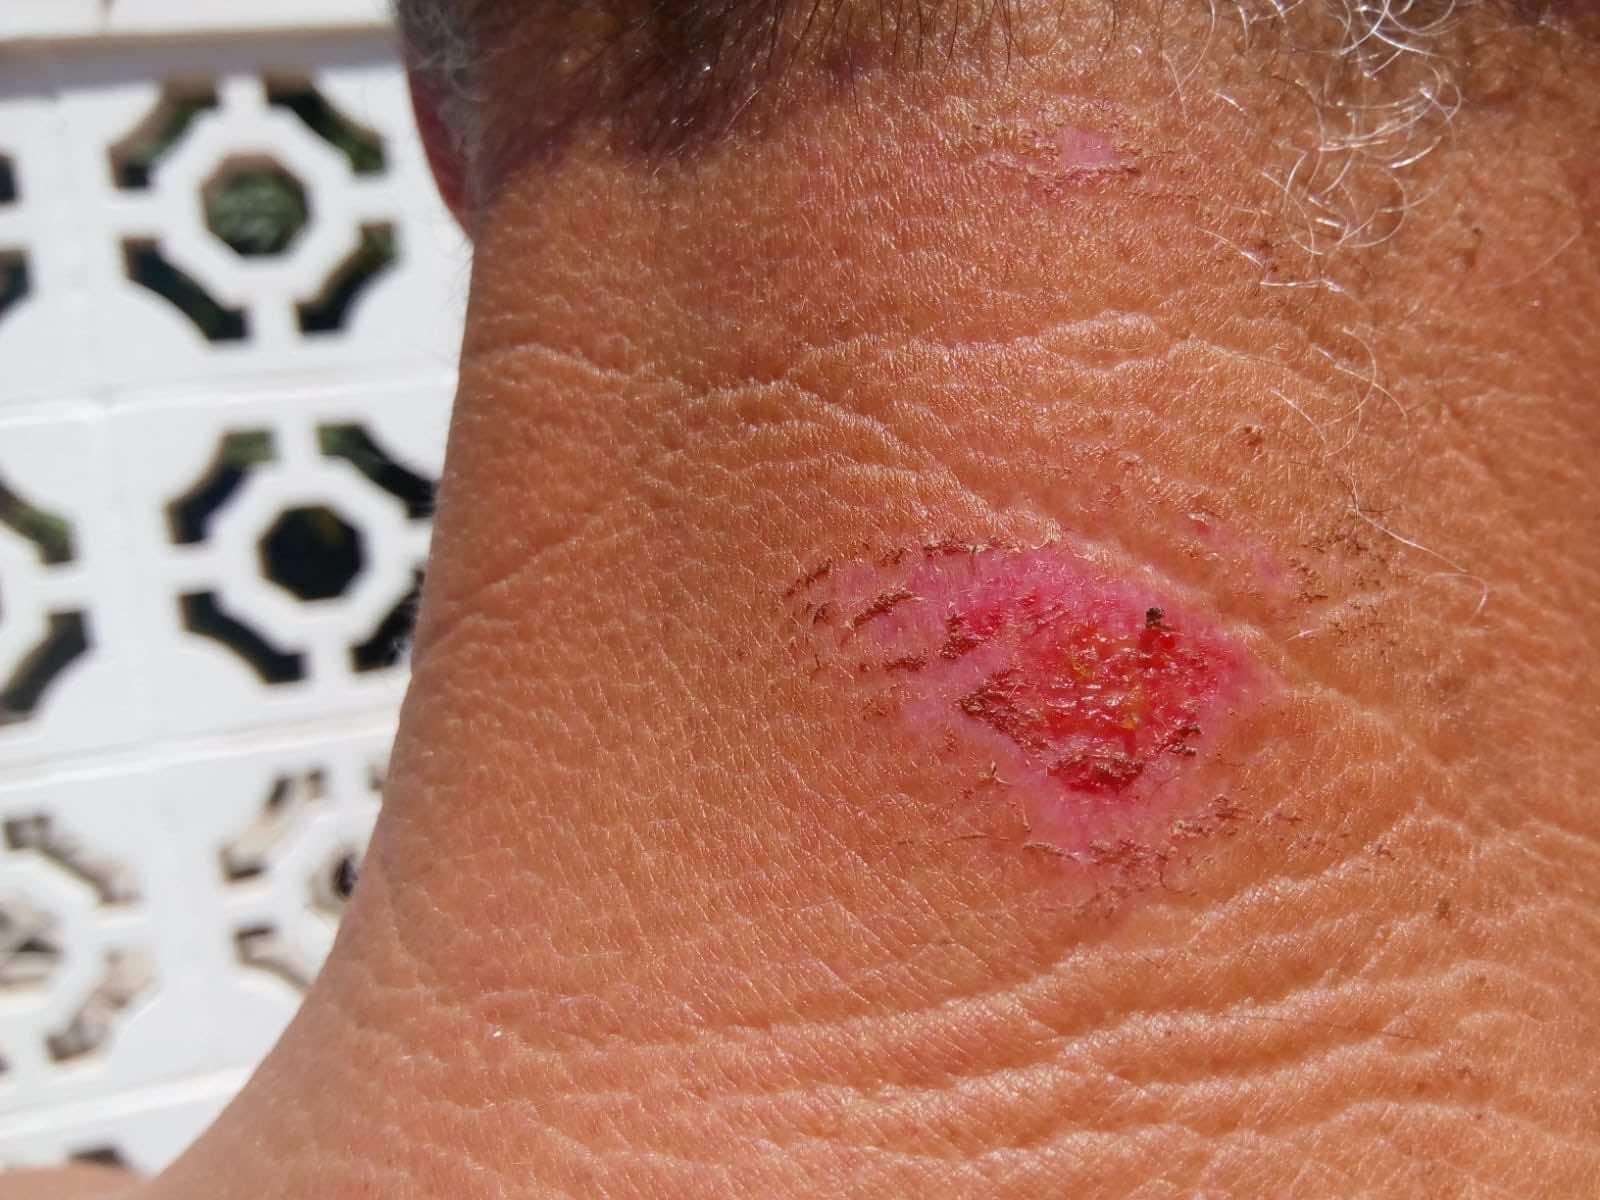 SwimRun wetsuit neck abrasion before Aloe